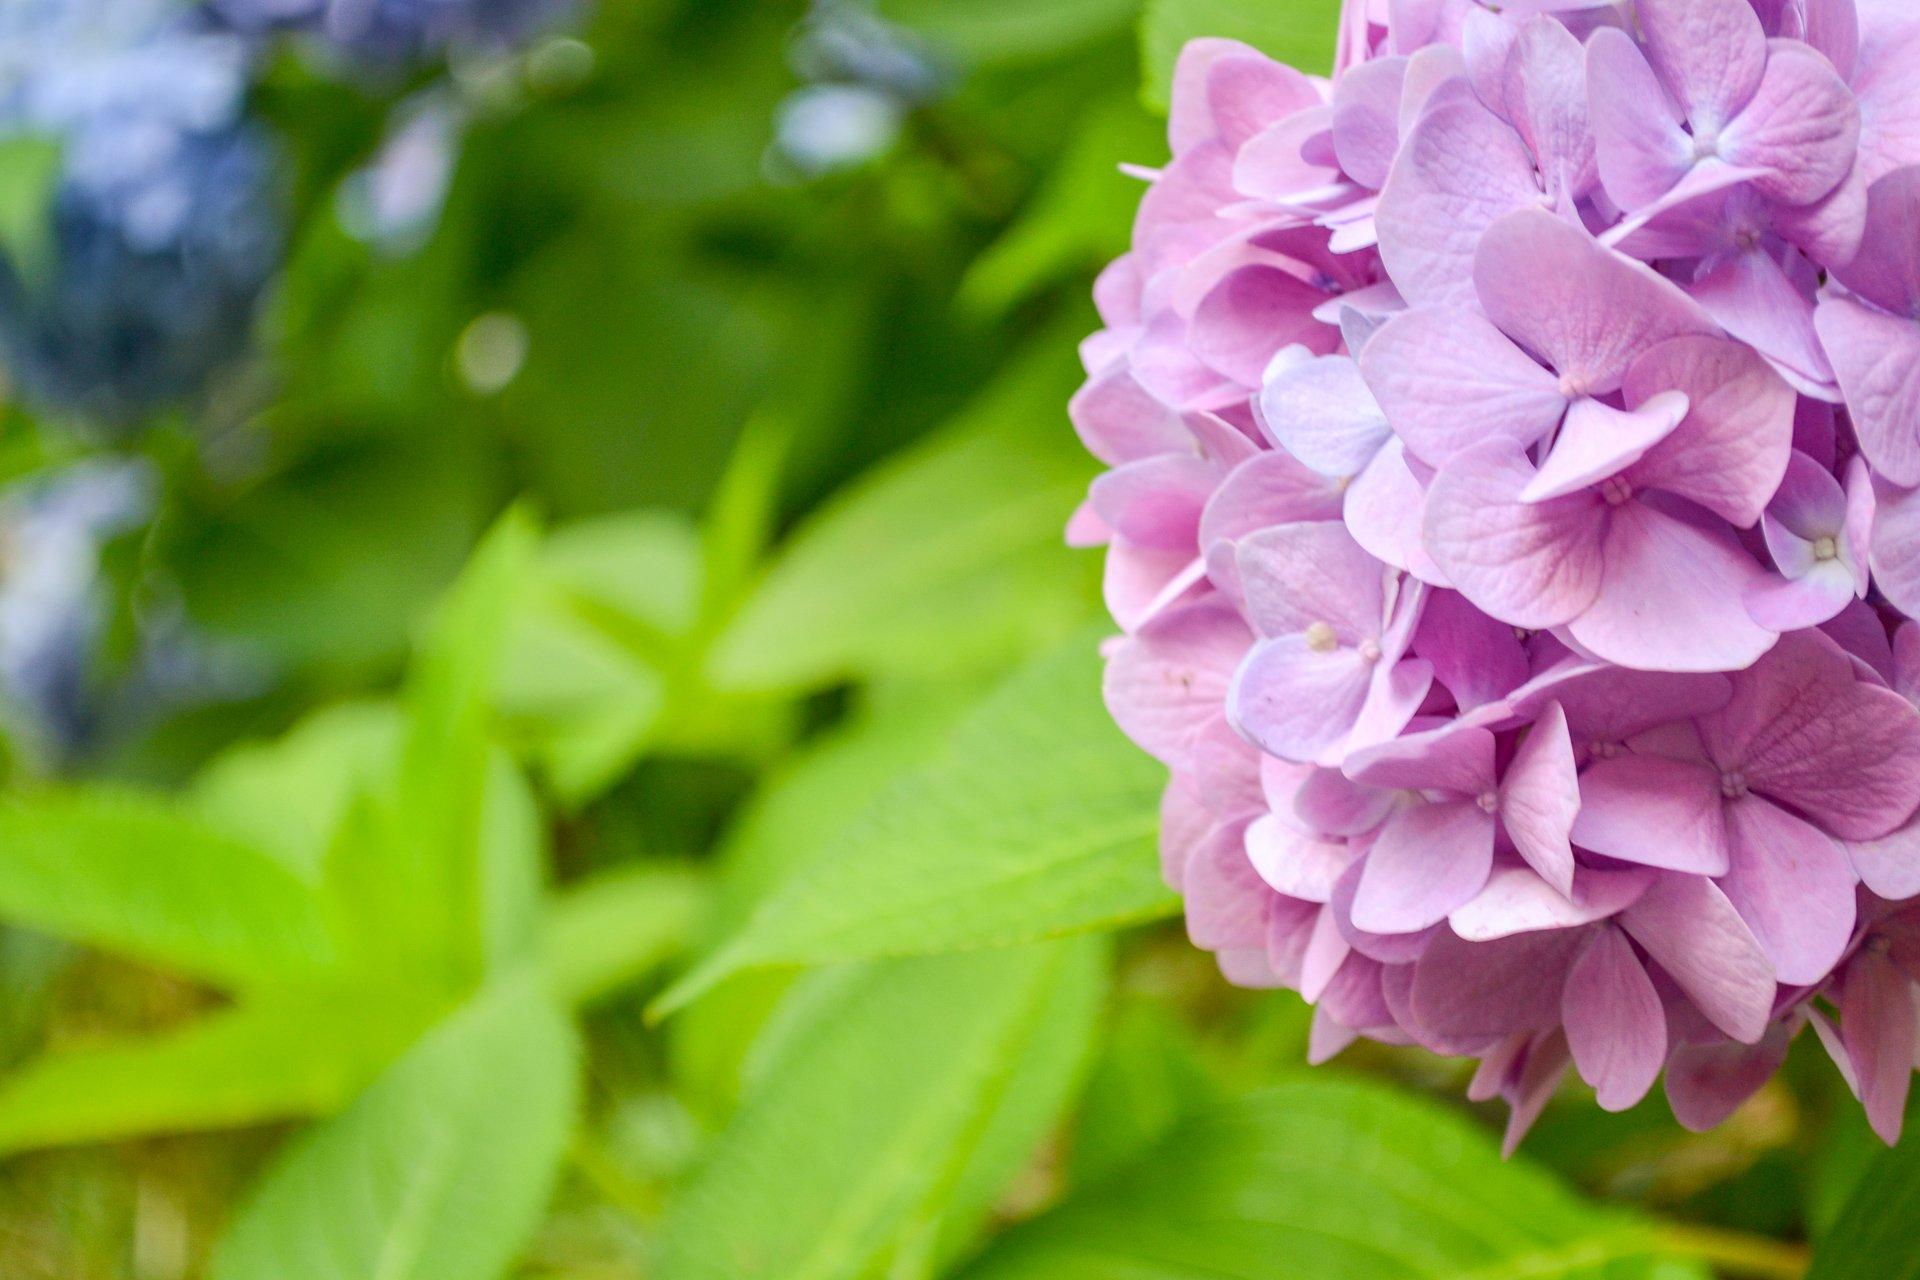 Hydrangeas turn pink in less-acidic soil.